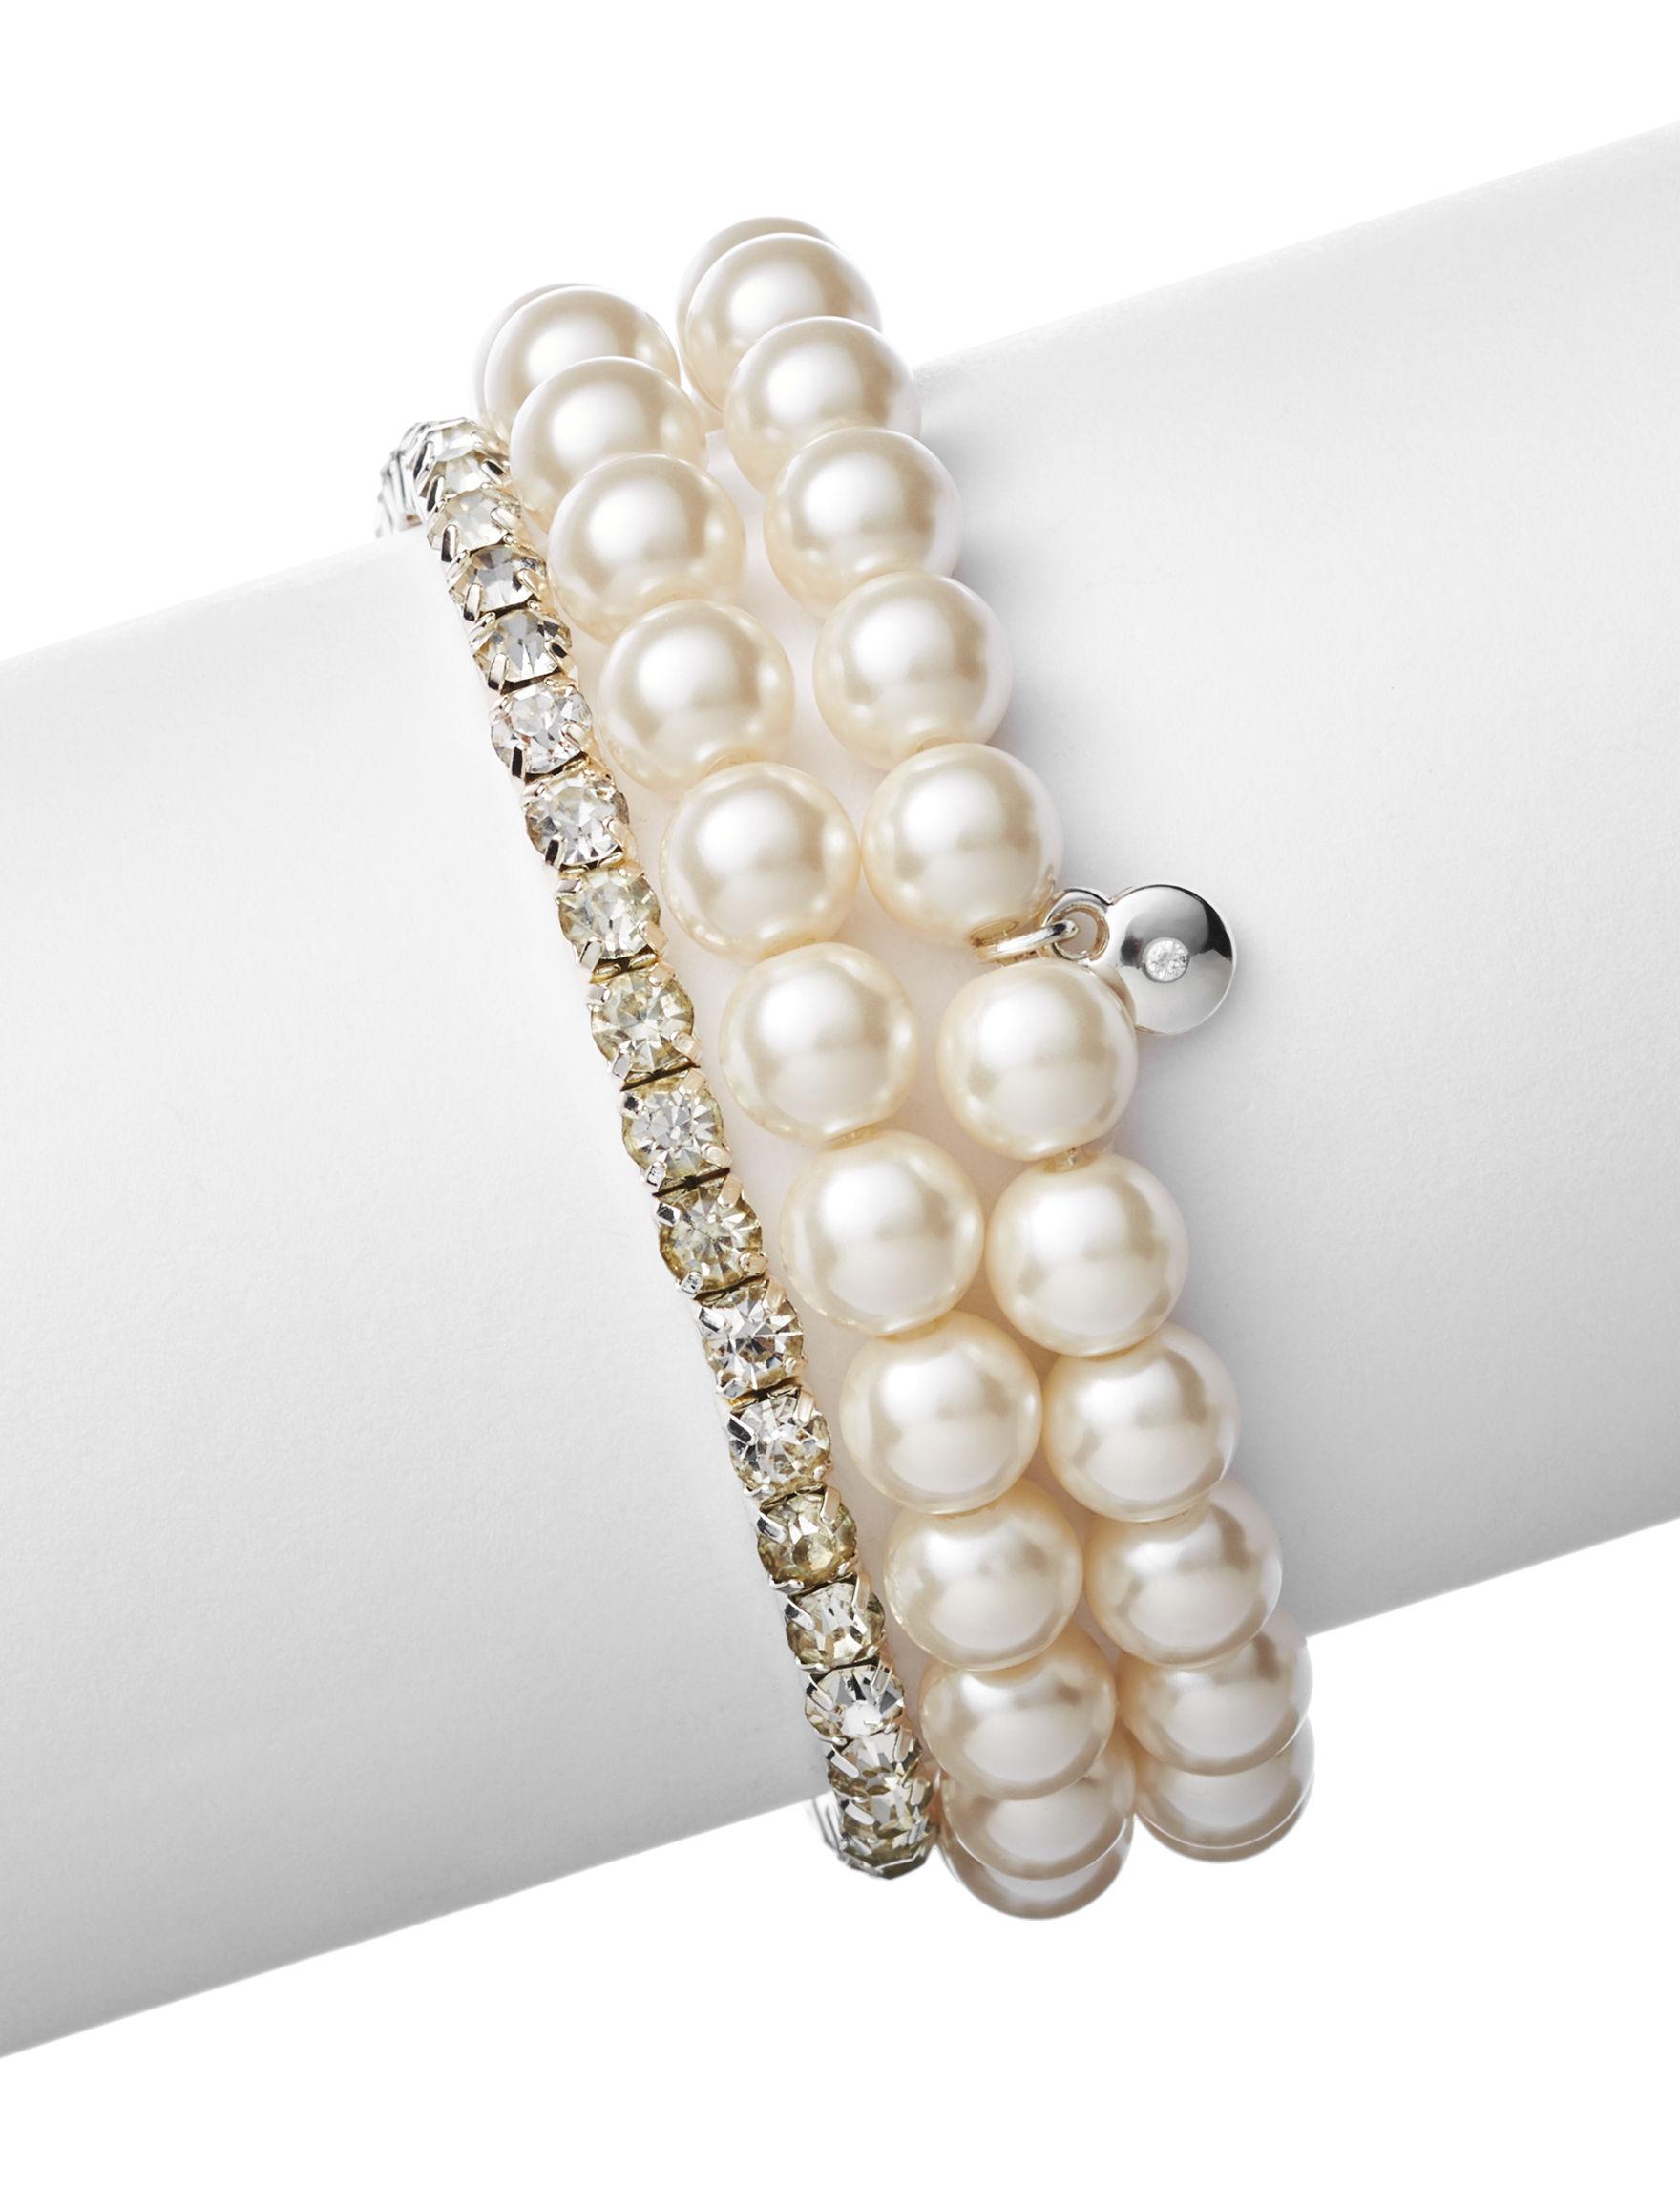 Hannah Beige Bracelets Jewelry Sets Fashion Jewelry